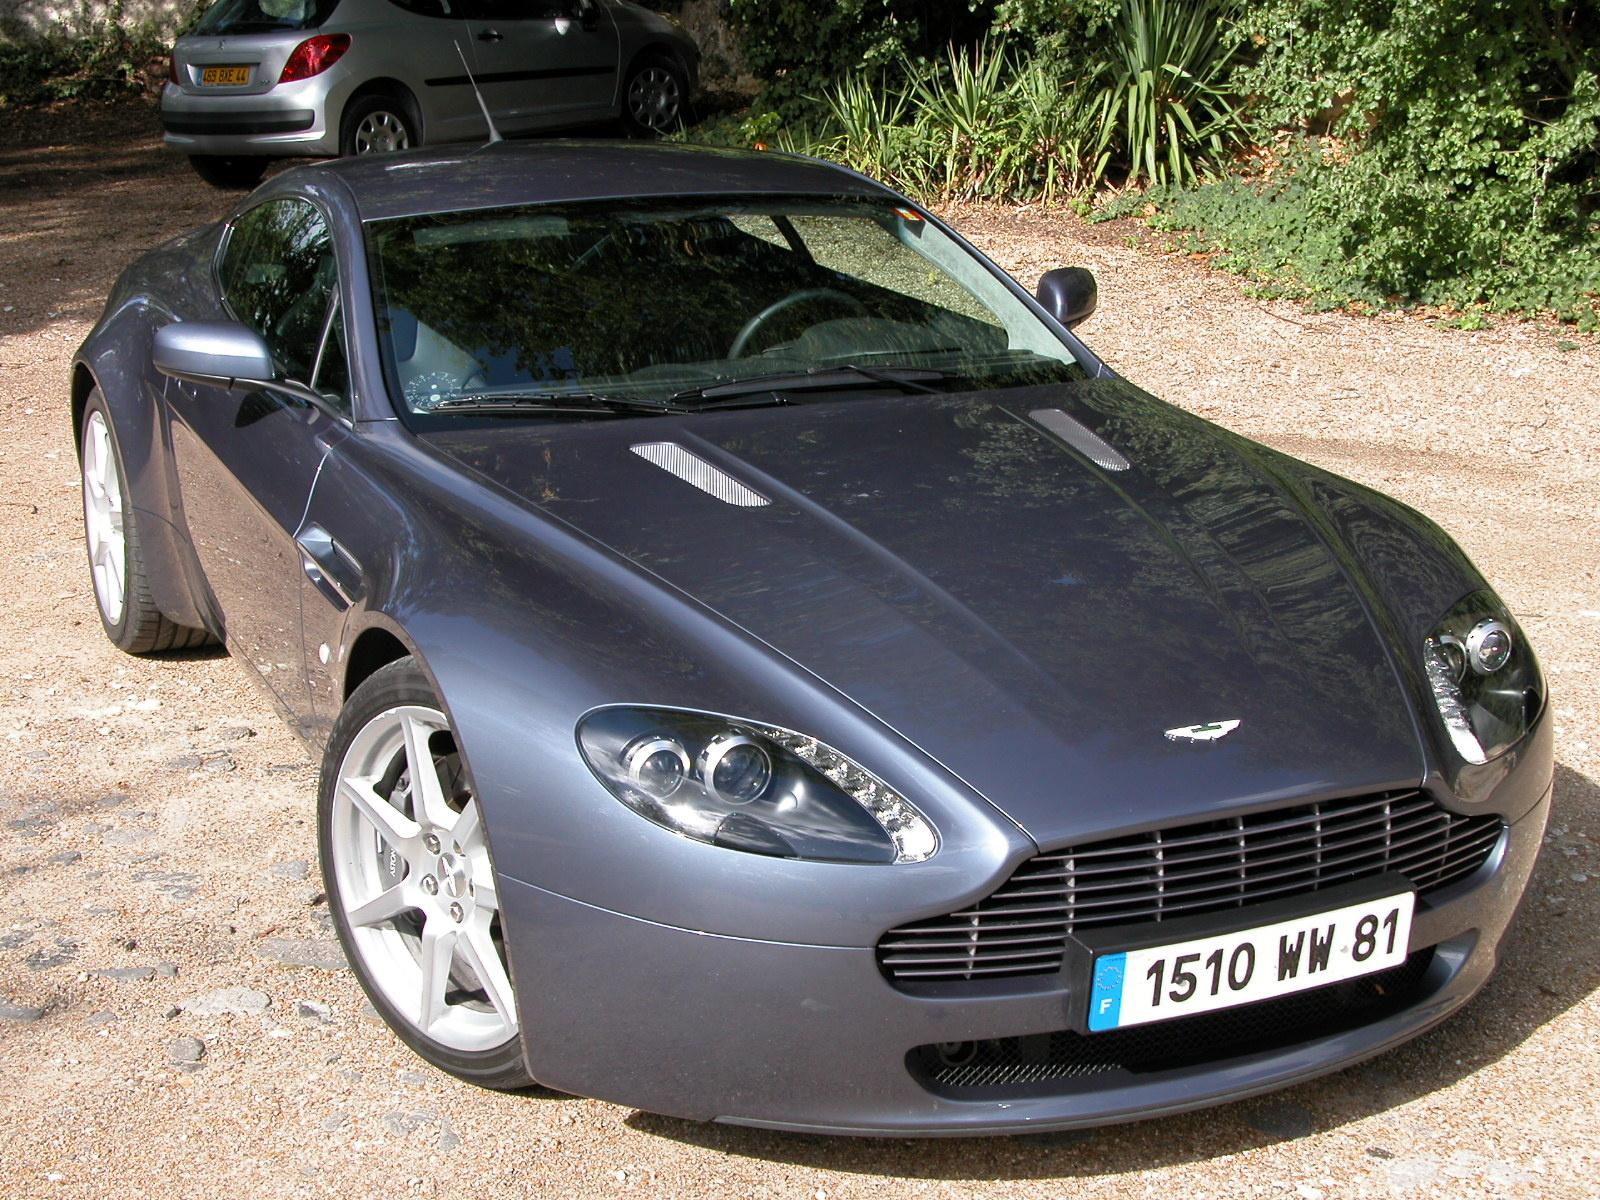 Aston Martin V Vantage Overview CarGurus - 2006 aston martin